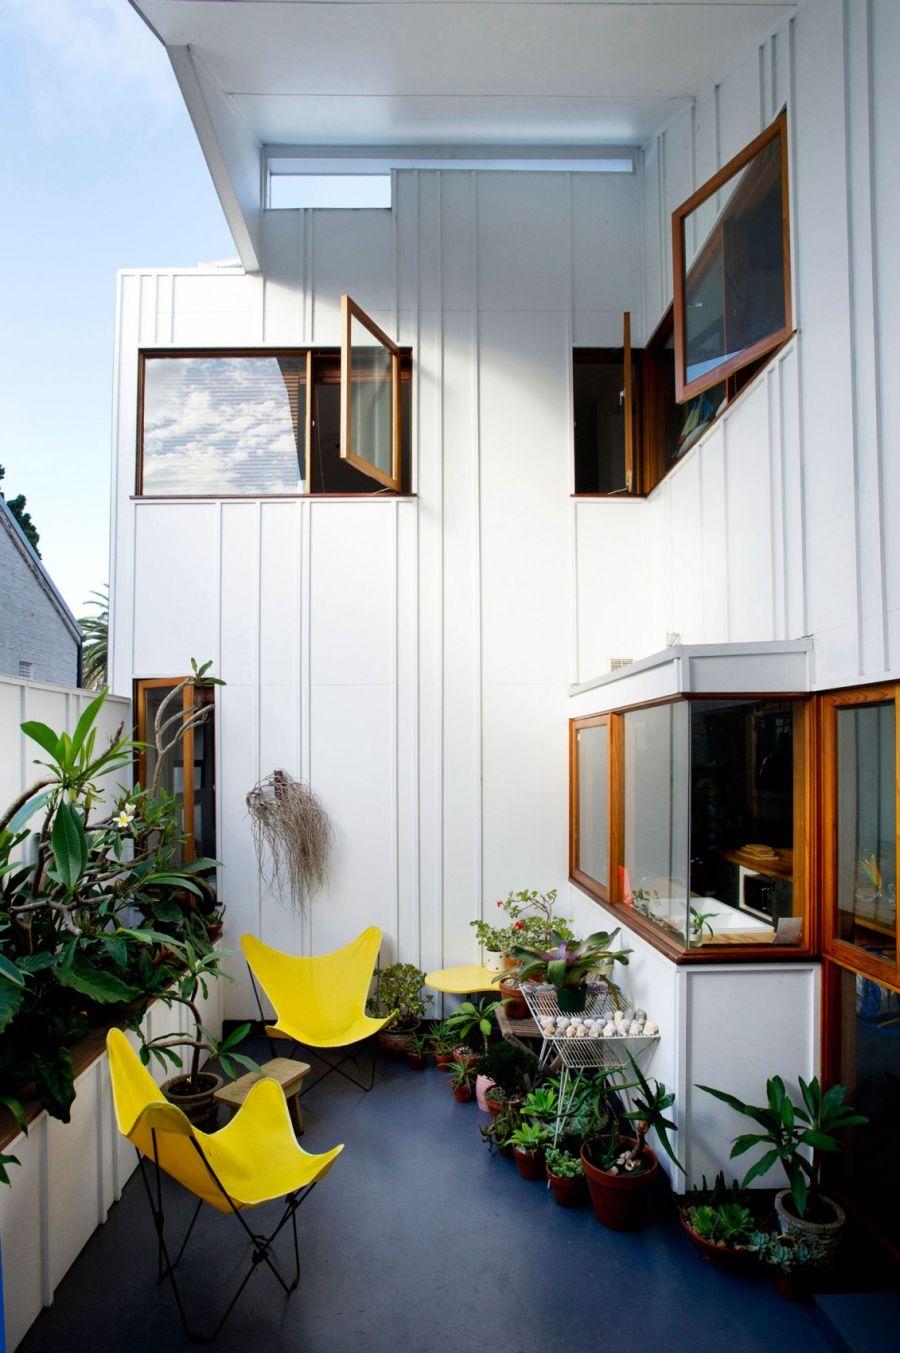 Colorful furnishings add a sense of airiness